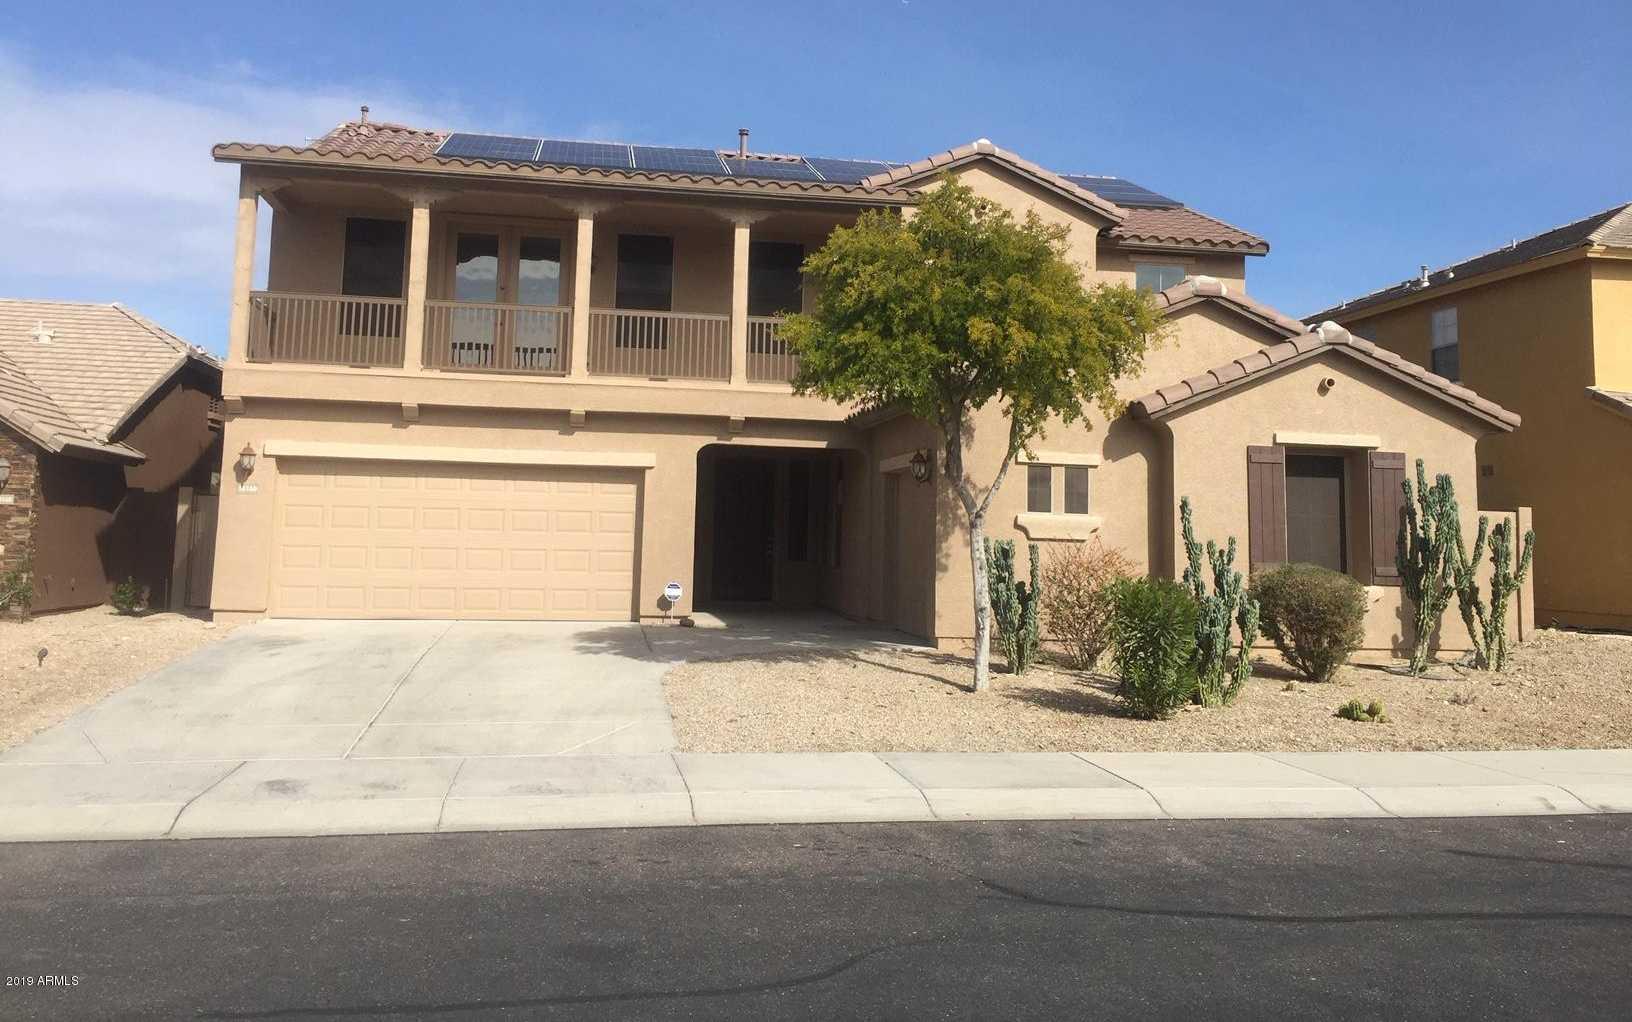 $395,000 - 5Br/4Ba - Home for Sale in Estrella Mountain Ranch Parcel 96b, Goodyear